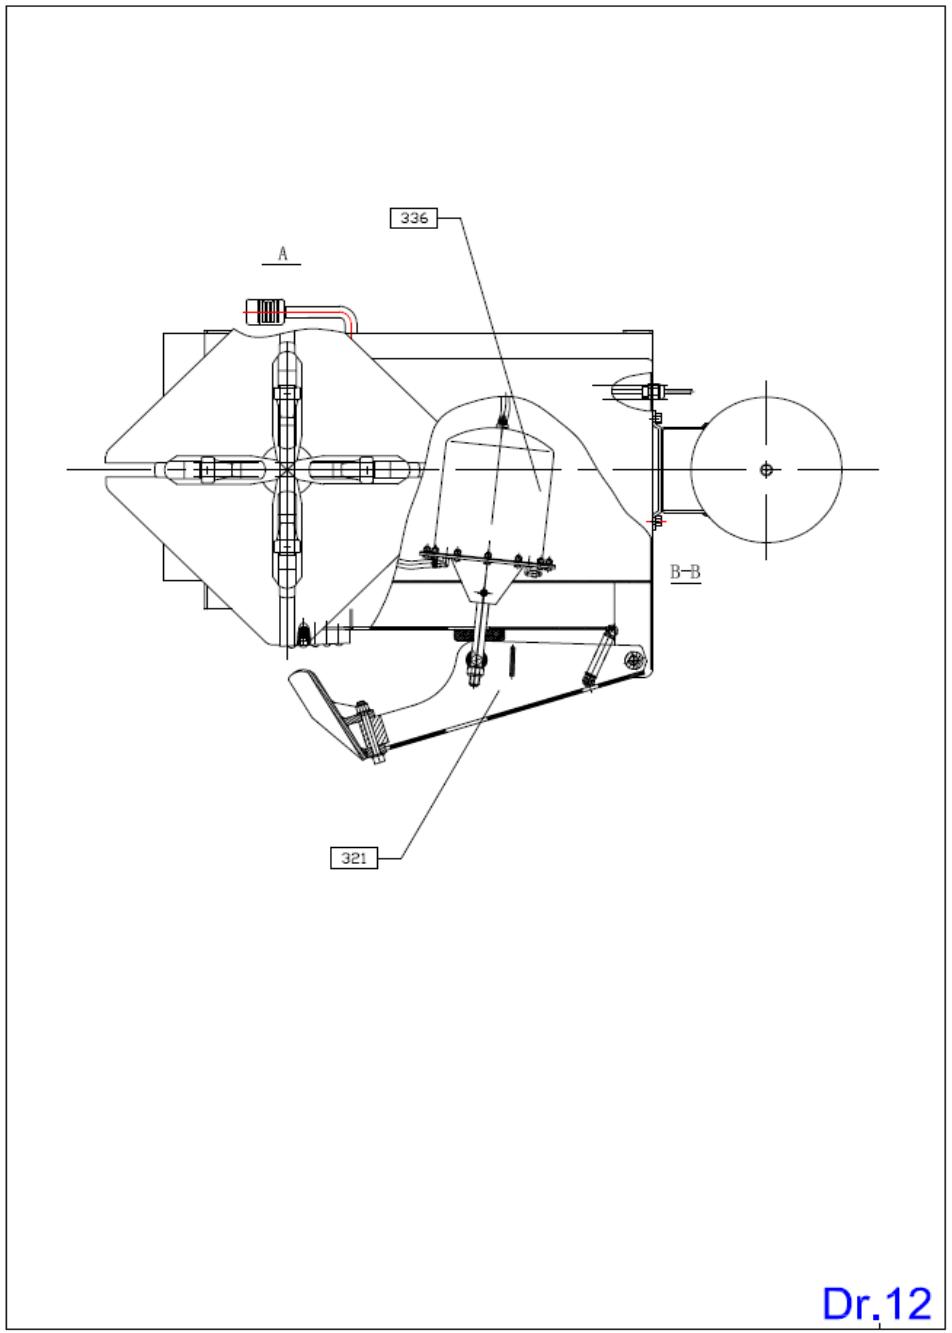 Tc589x_manual_version5 Tc589x Manual